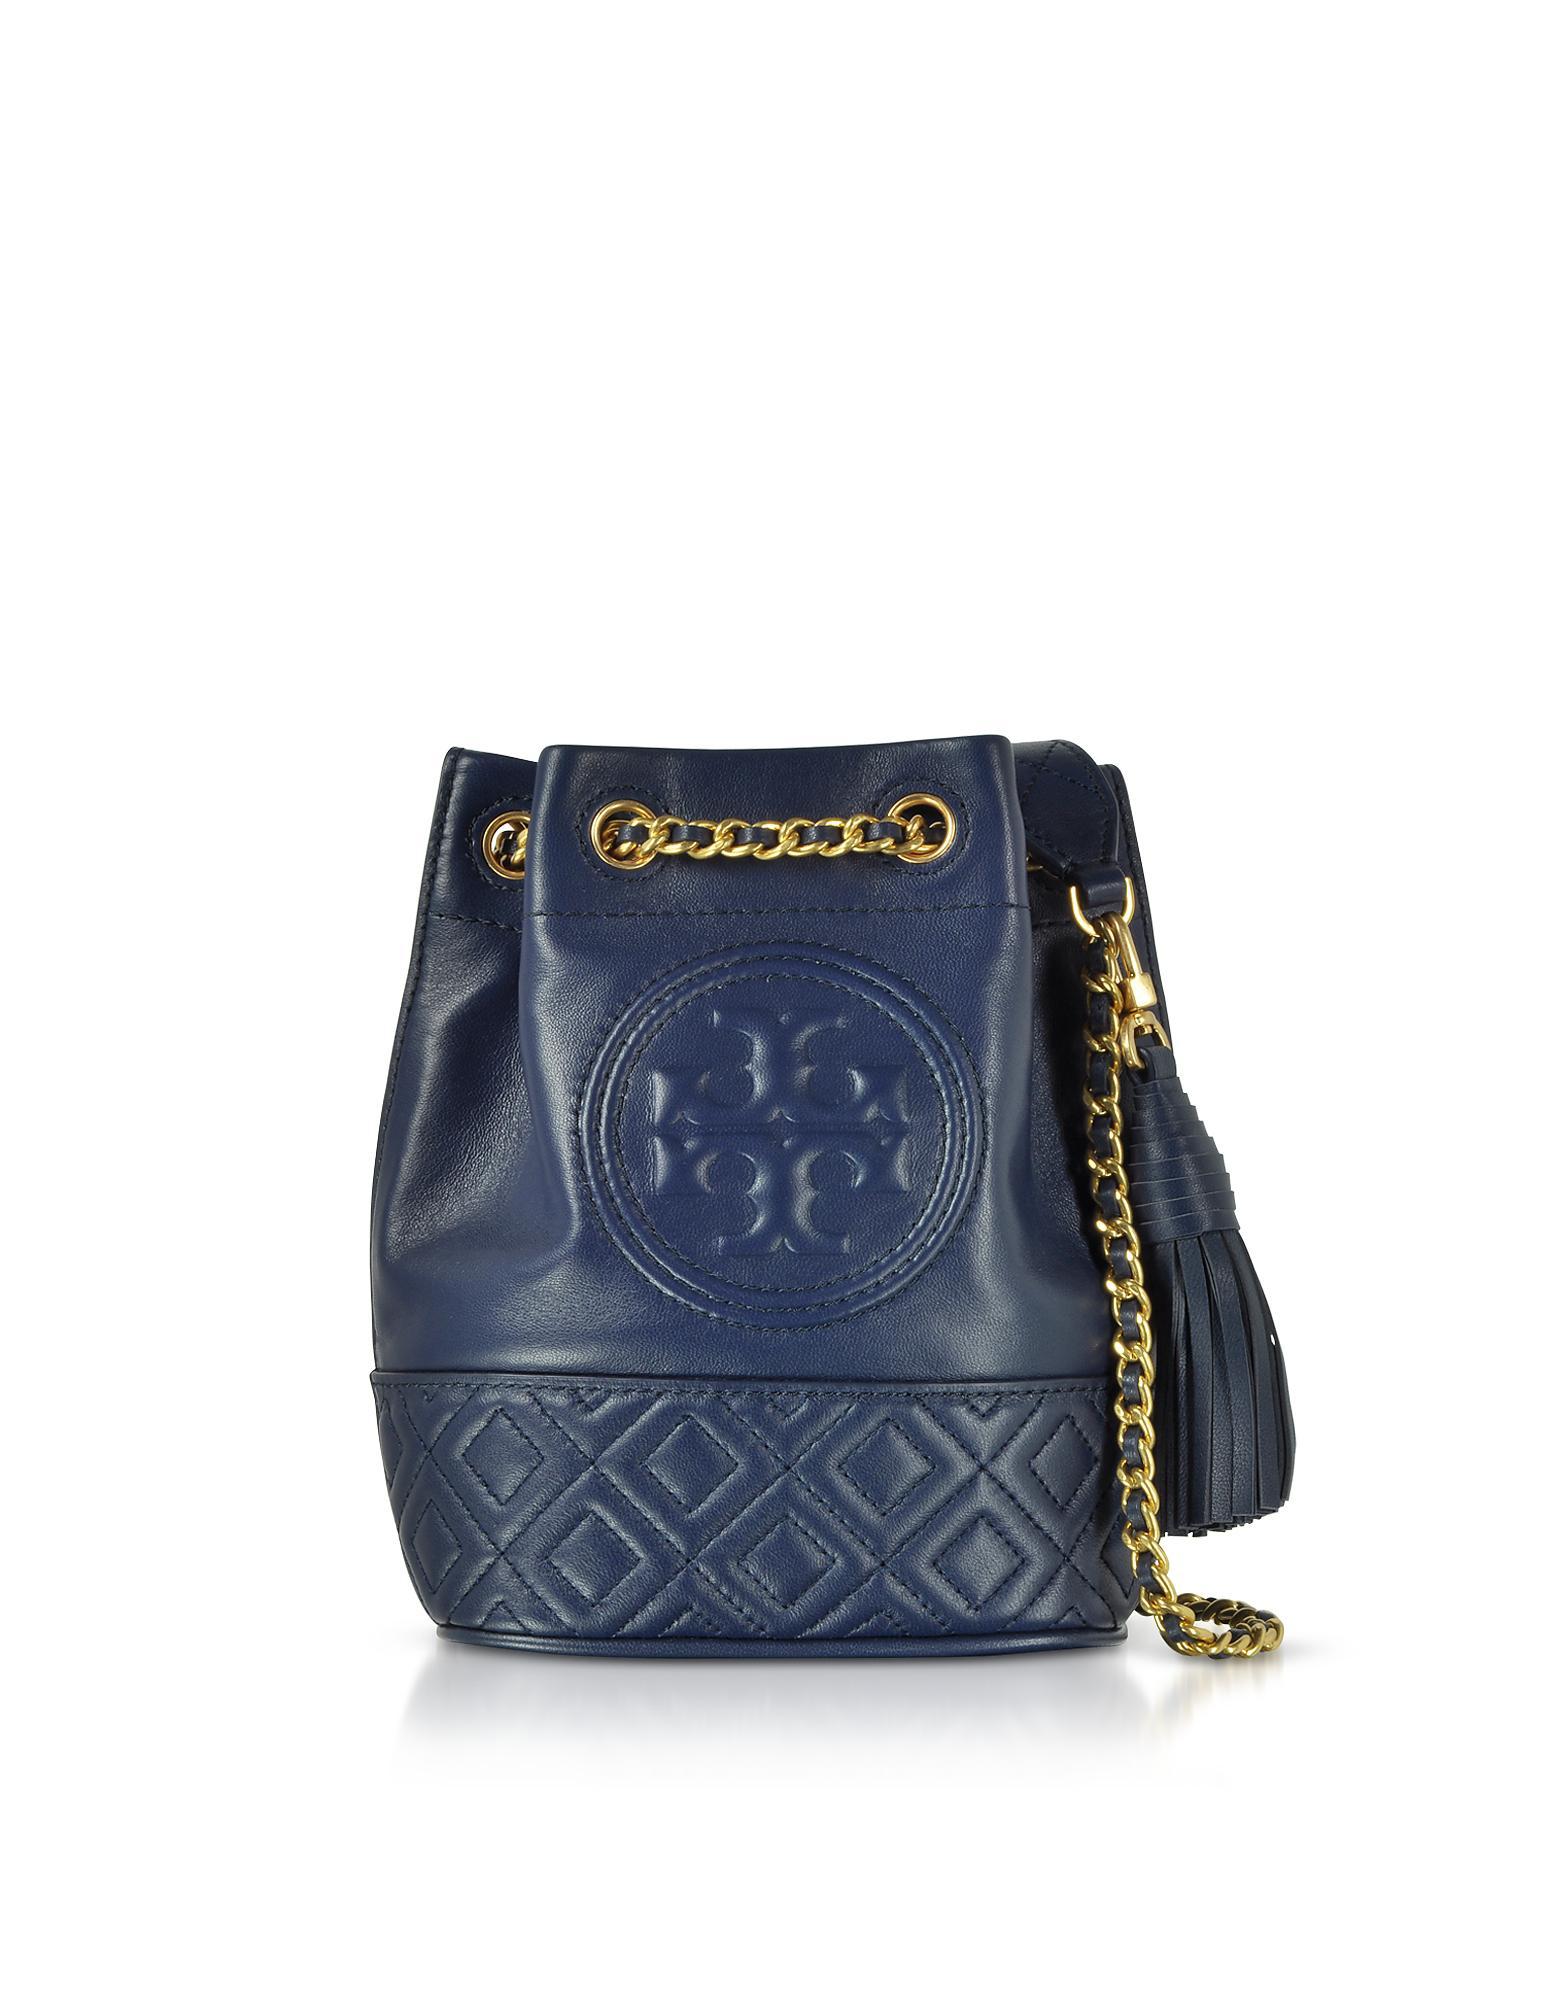 6cae134b1cf7 Tory Burch Fleming Mini Bucket Bag in Blue - Lyst